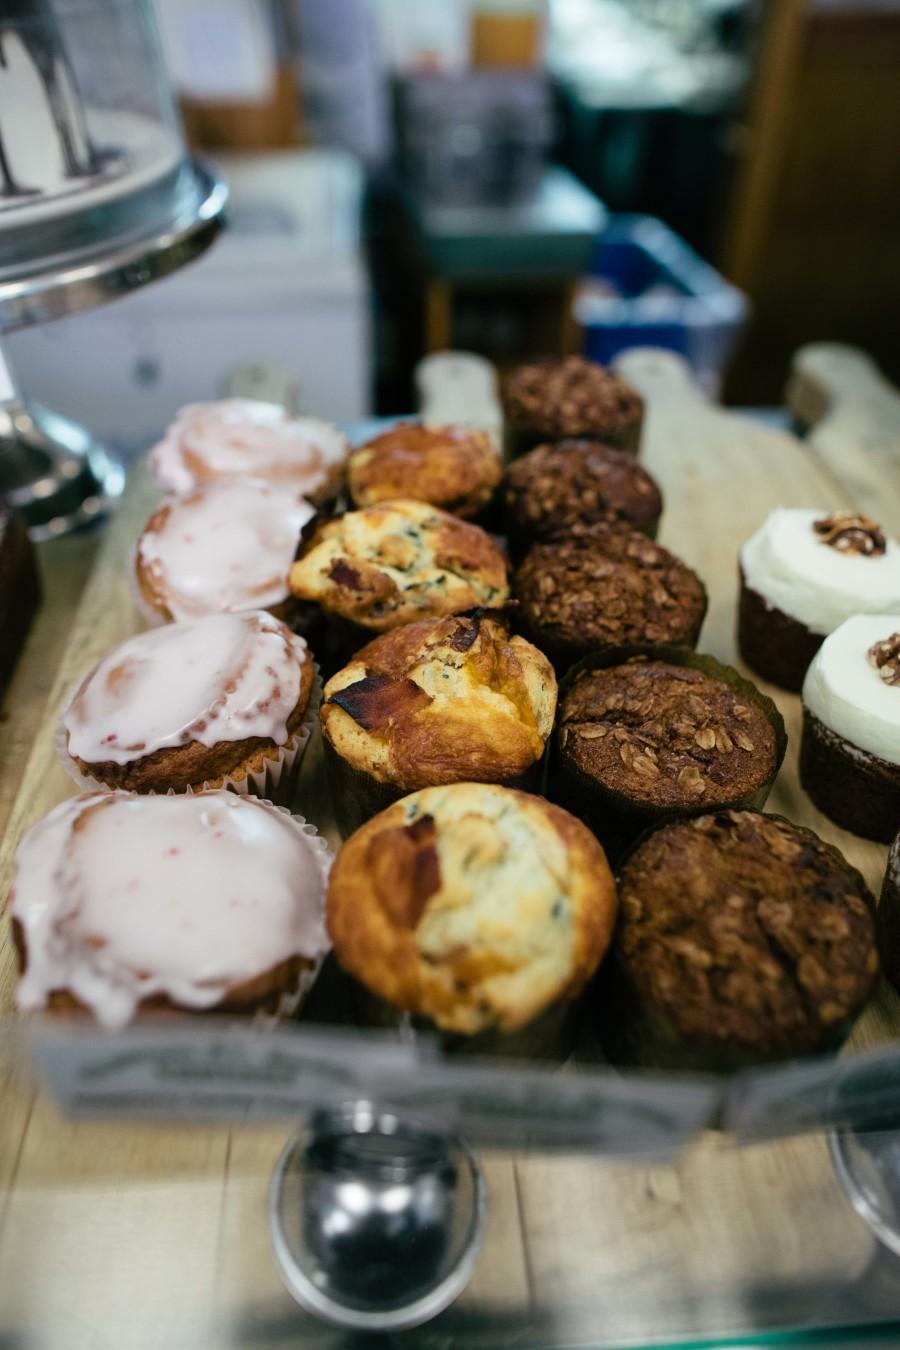 Clinton Street Bakery cakes